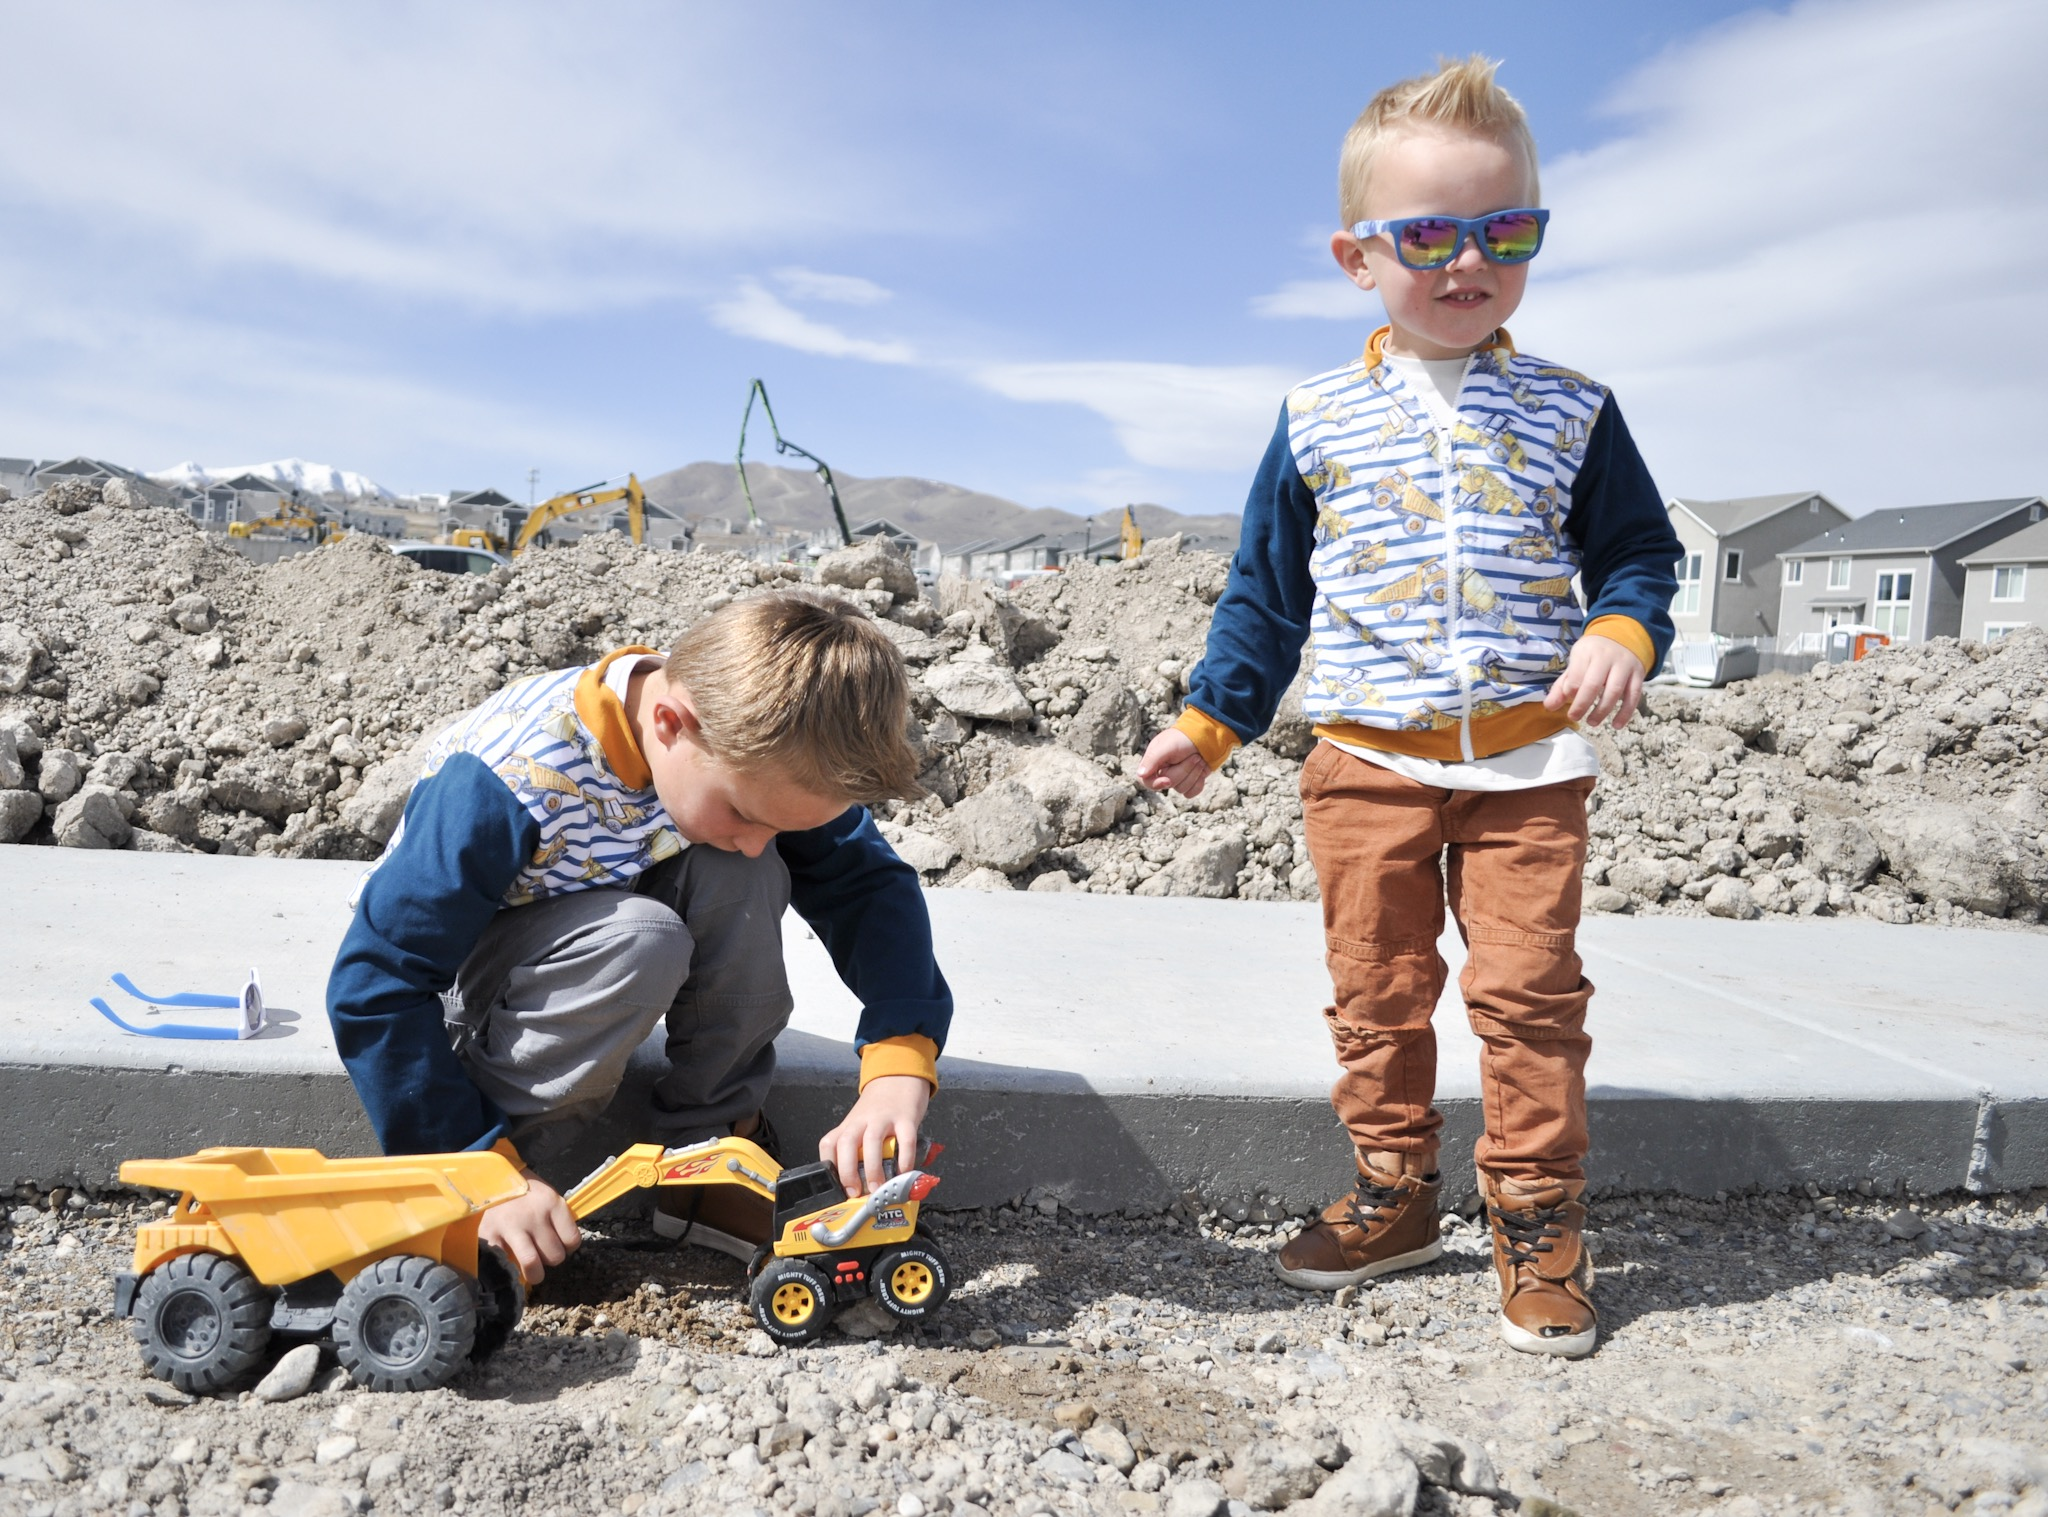 Two boys wearing matching jackets playing outside.